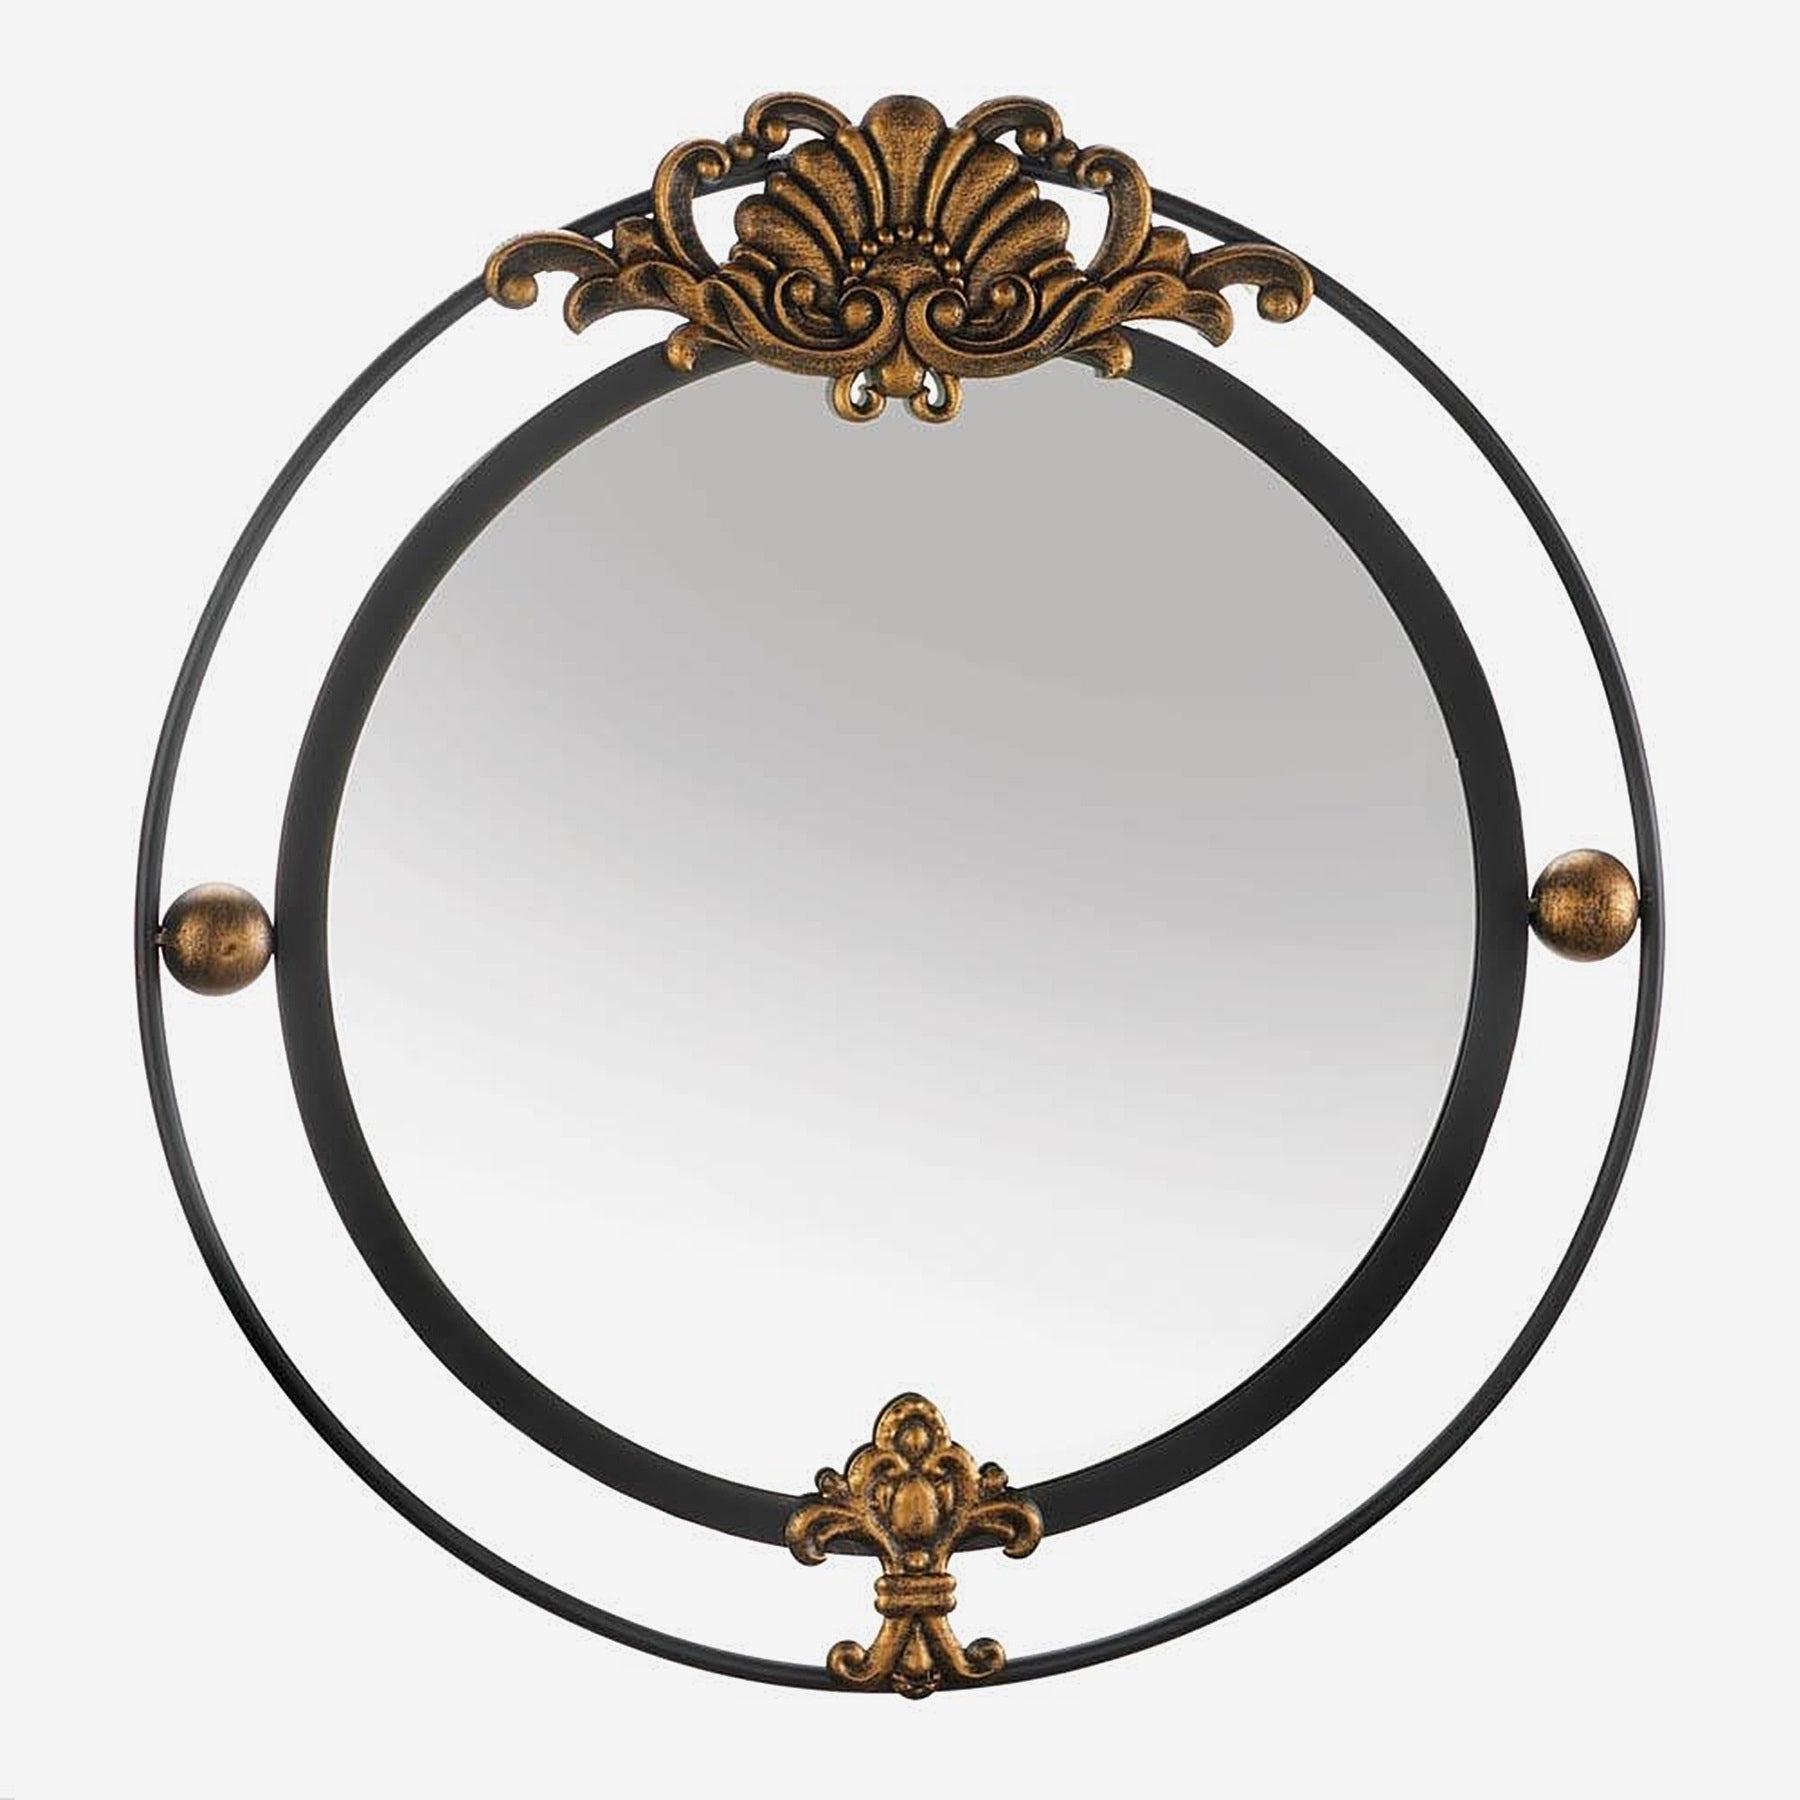 Garfield Decorative Round Wall Mirror – Black/gold Throughout Most Current Decorative Round Wall Mirrors (View 17 of 20)